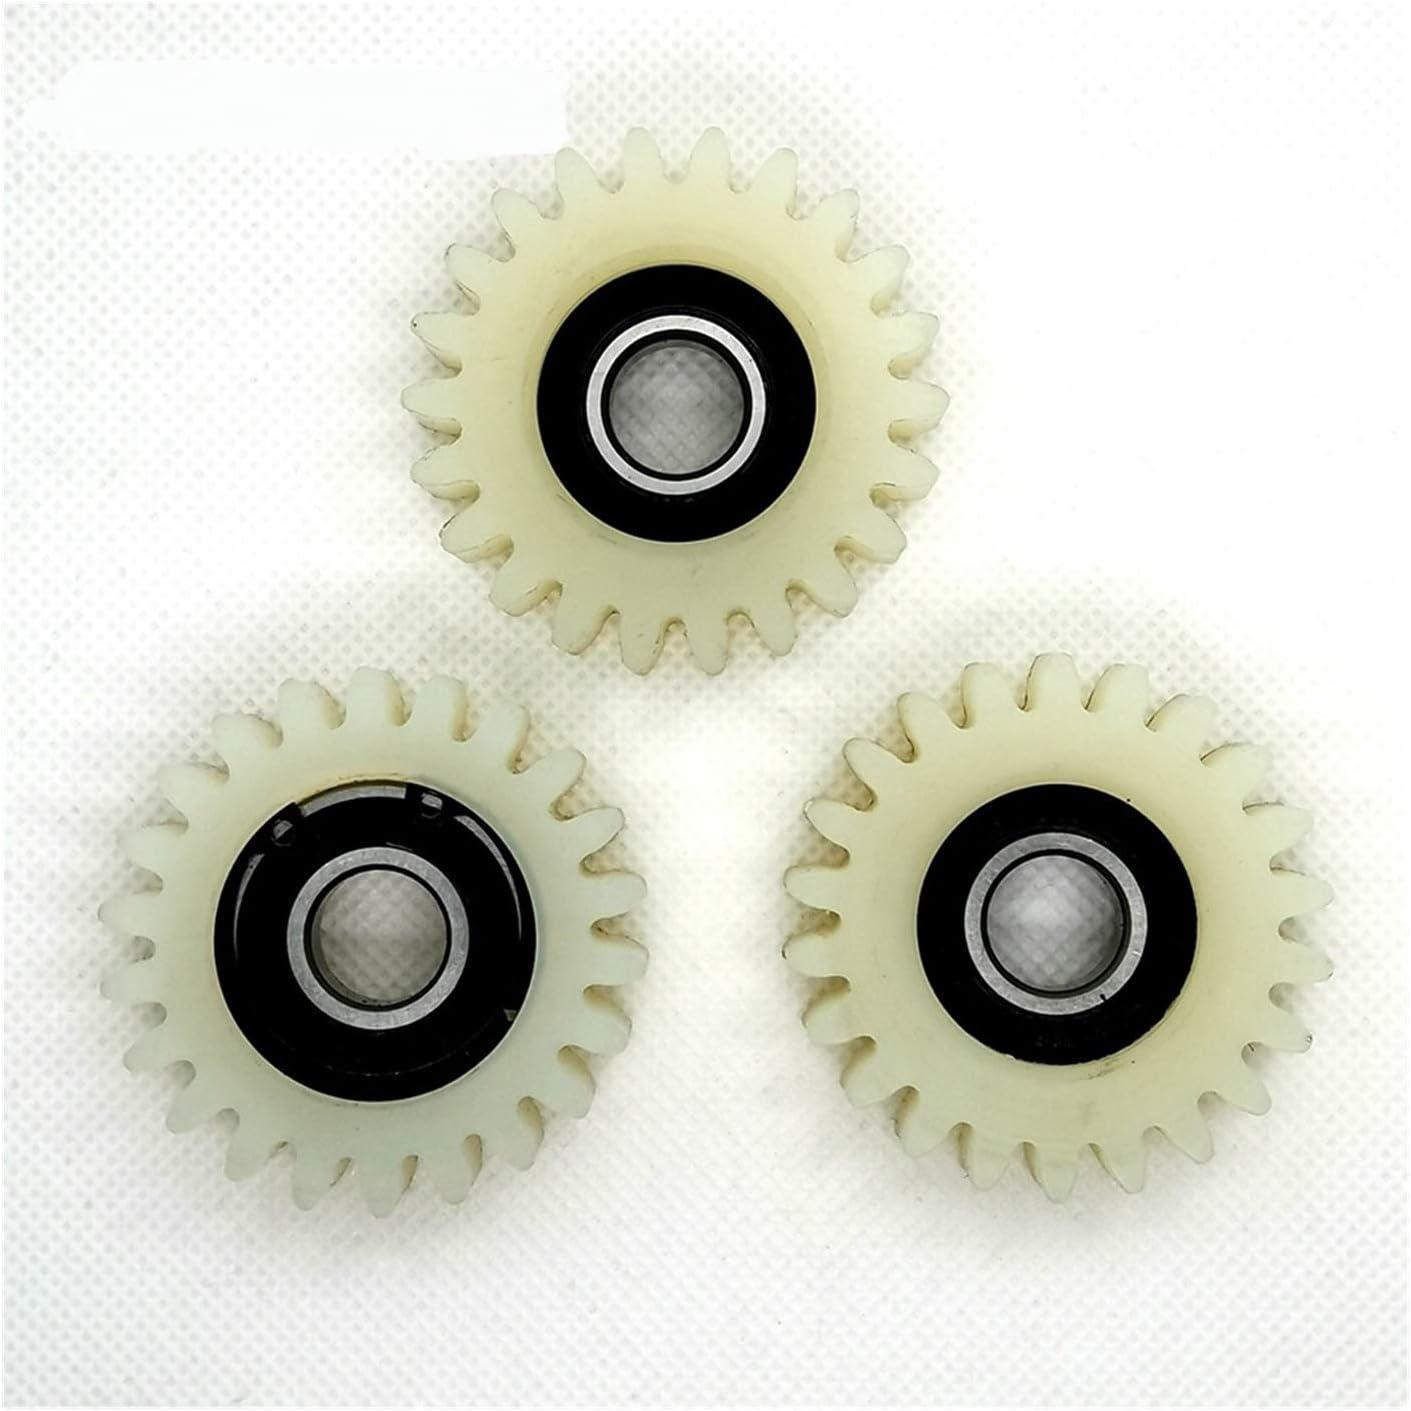 Choice TONGCHAO Tchaogr 3pcs Gears 22 Nylon Teeth Plasitc 48mm Financial sales sale Pinions